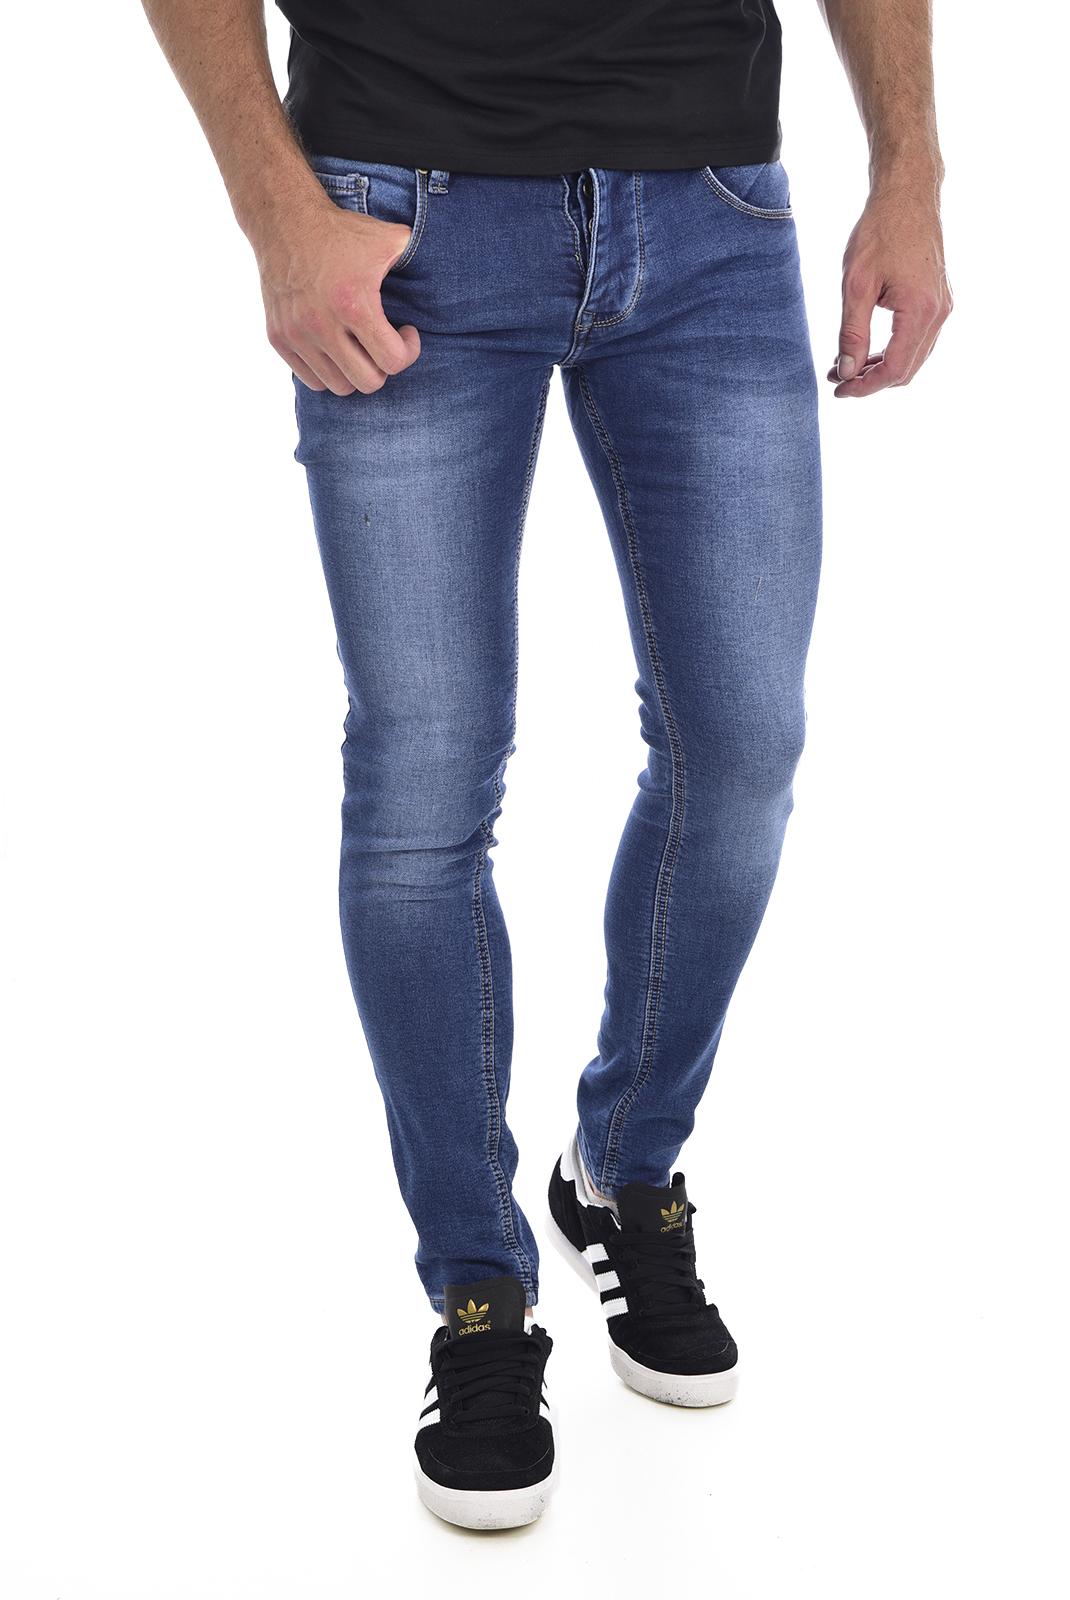 Jeans  Leo gutti L01053 bleu